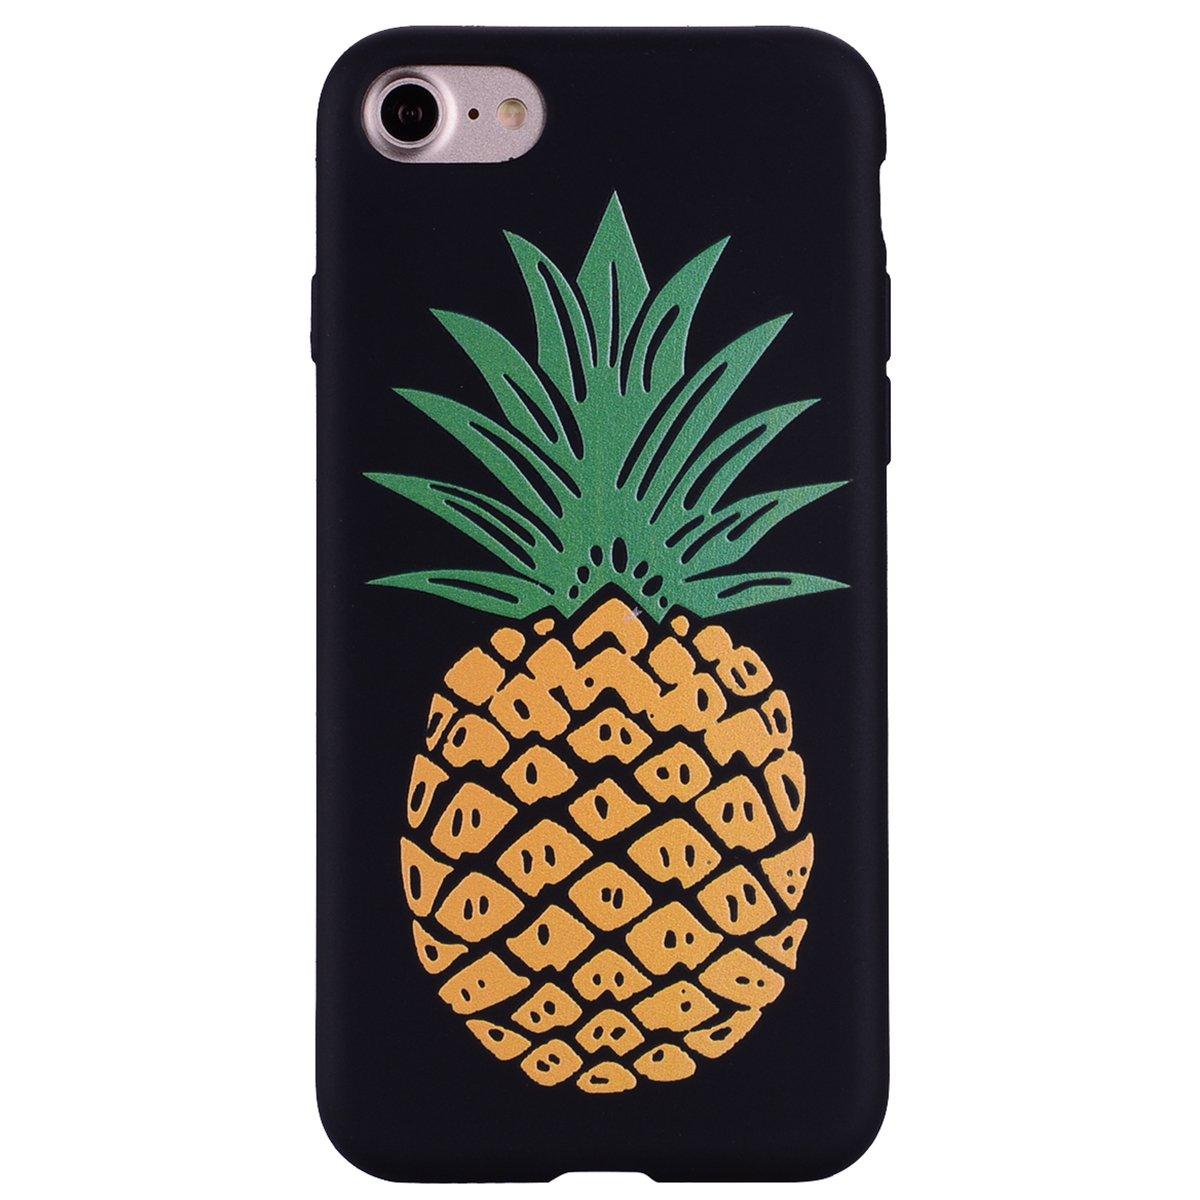 Coque iPhone 7, Anlike iPhone 7 (4,7 Zoll) Té lé phone Coque / É tui Flexible protection en Soft TPU Silicone Shell Etui Housse de Protection Coque Etui Silicone Transparente case cover pour [iPhone 7 (4,7 Zoll)] - Ananas de couleur